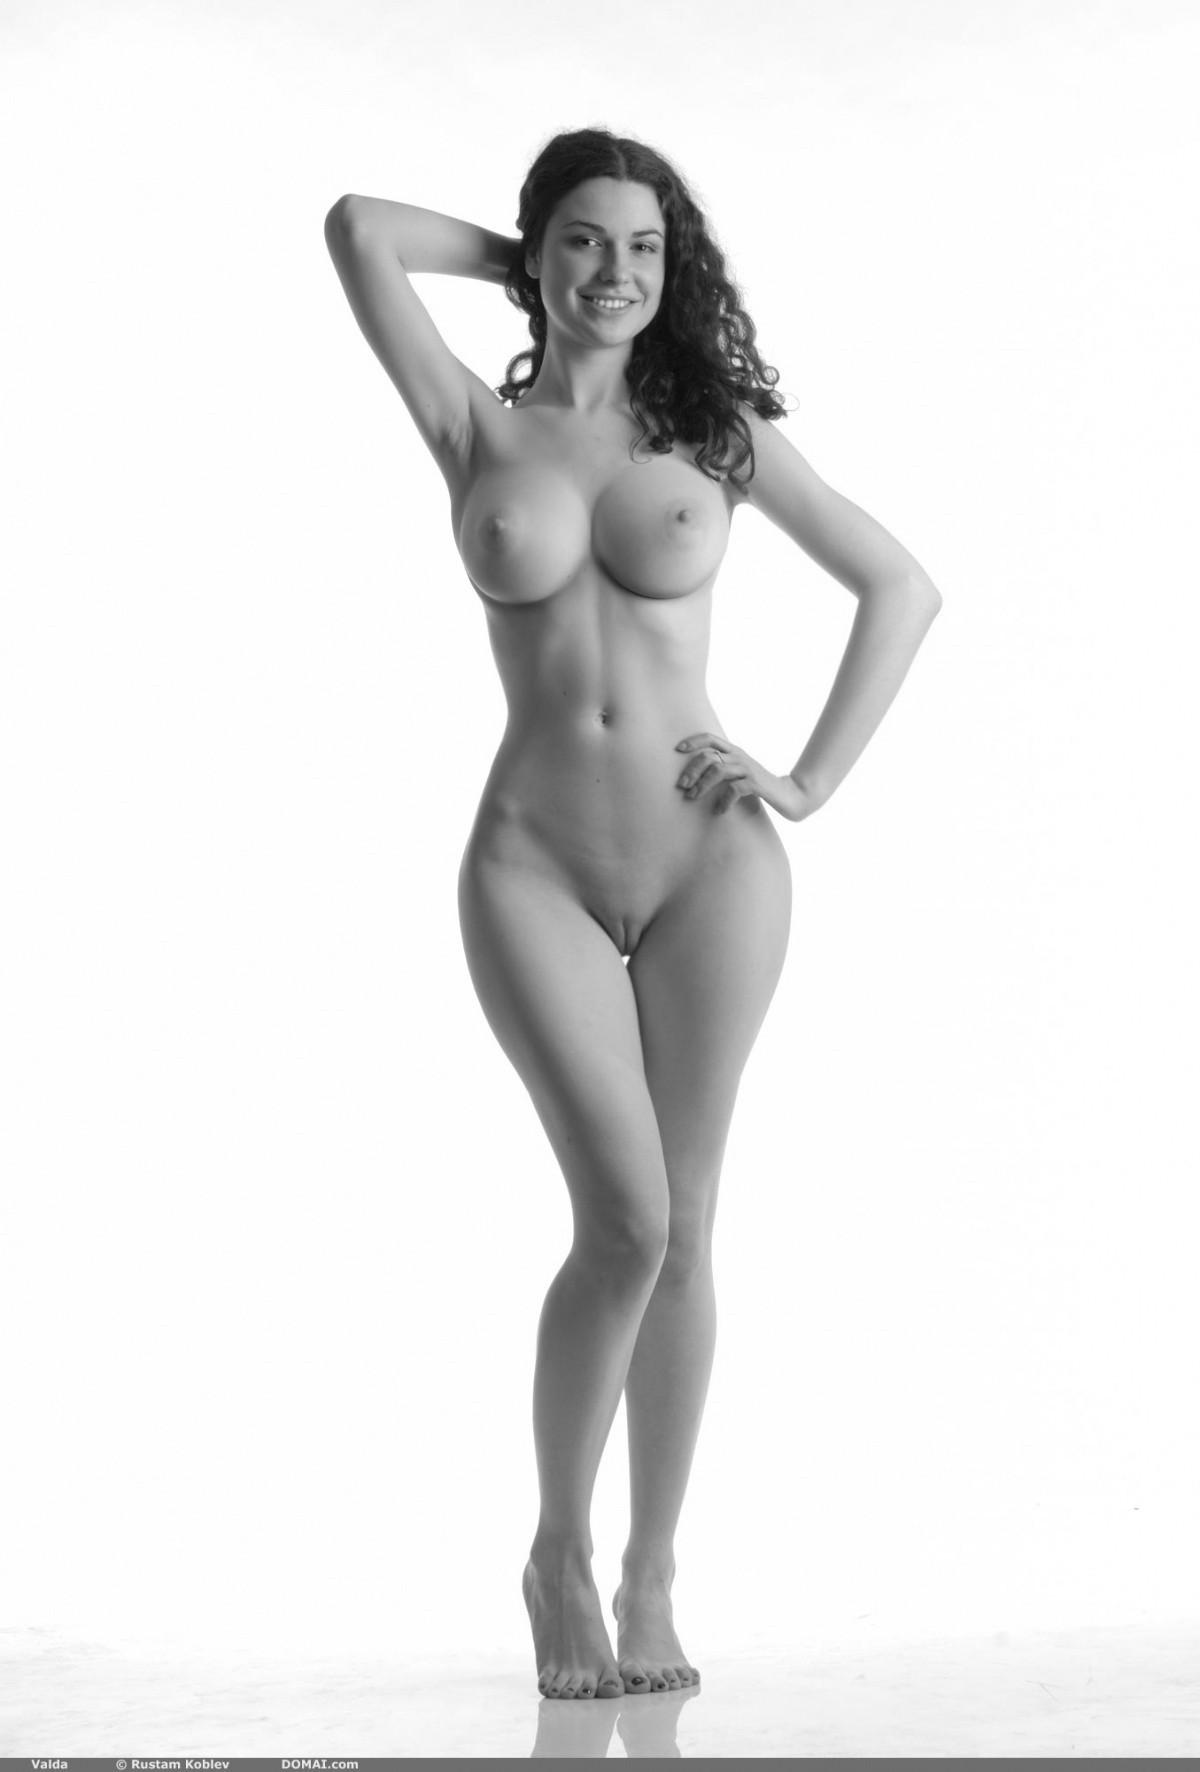 emma watson upskirt see through panties pictures are hot emma watson upskirt Artistic, Blackandwhite, Breasts, Nipples, Nude